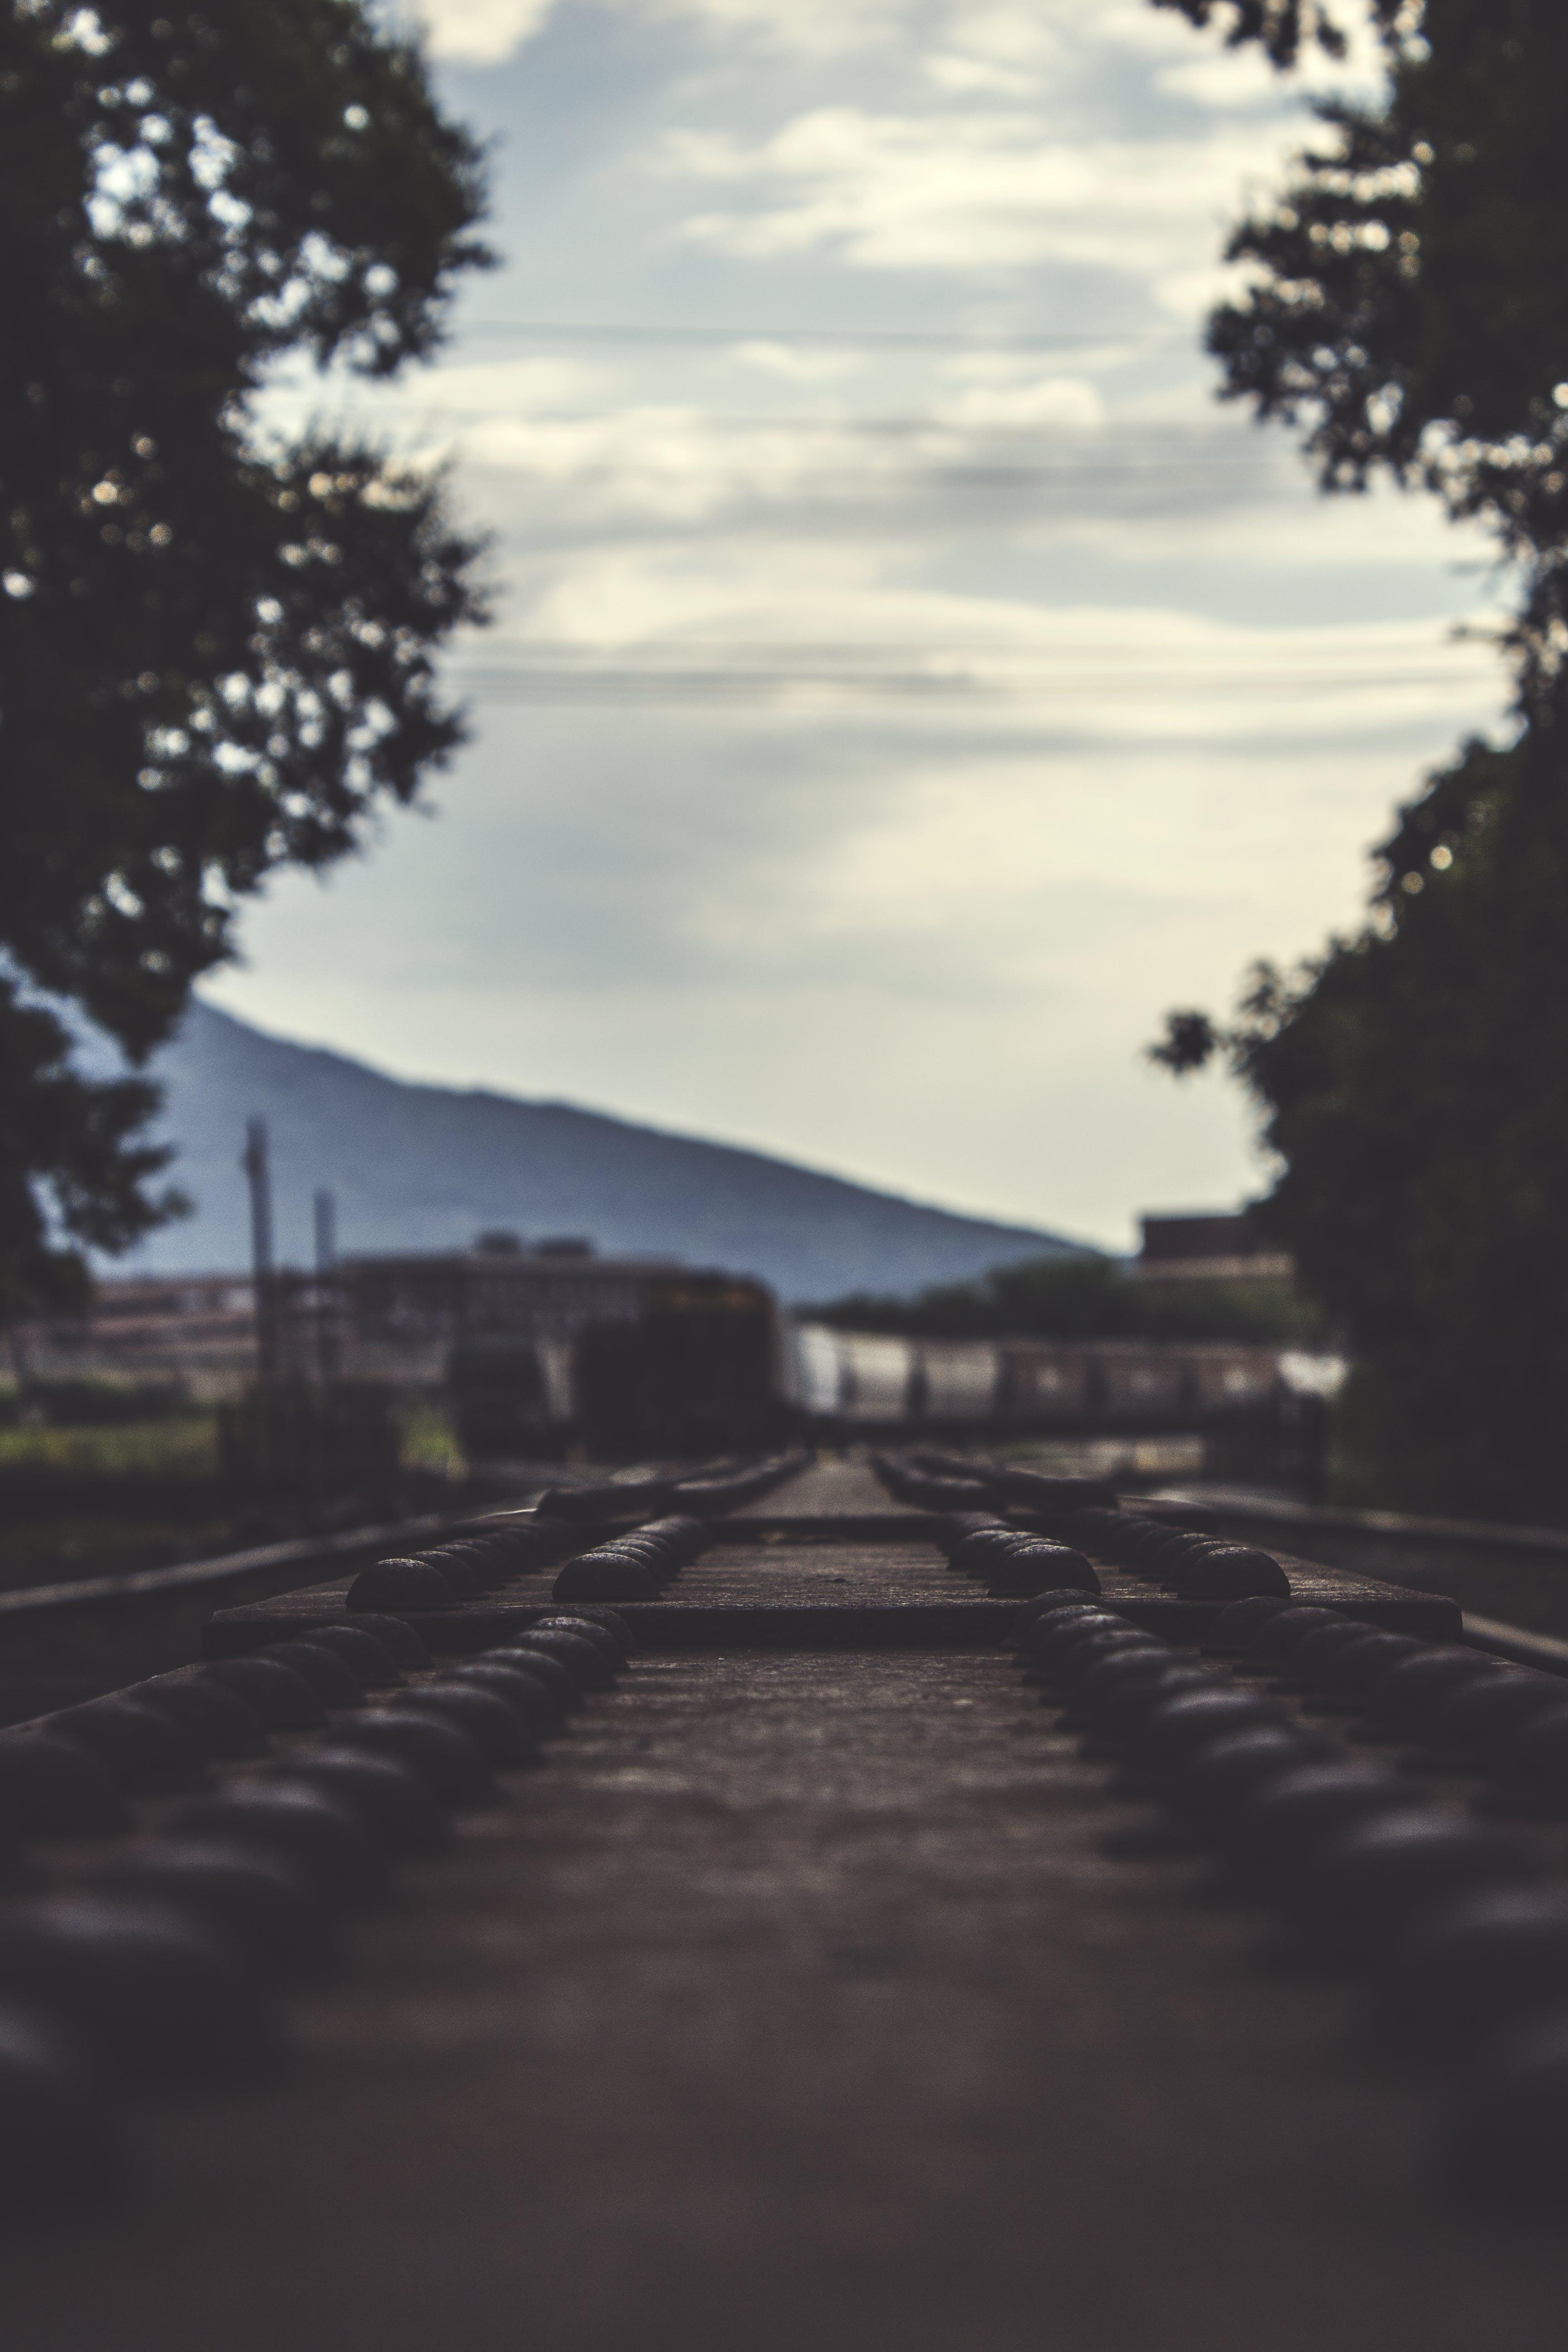 infrastruktur, jernbane, jernbanespor